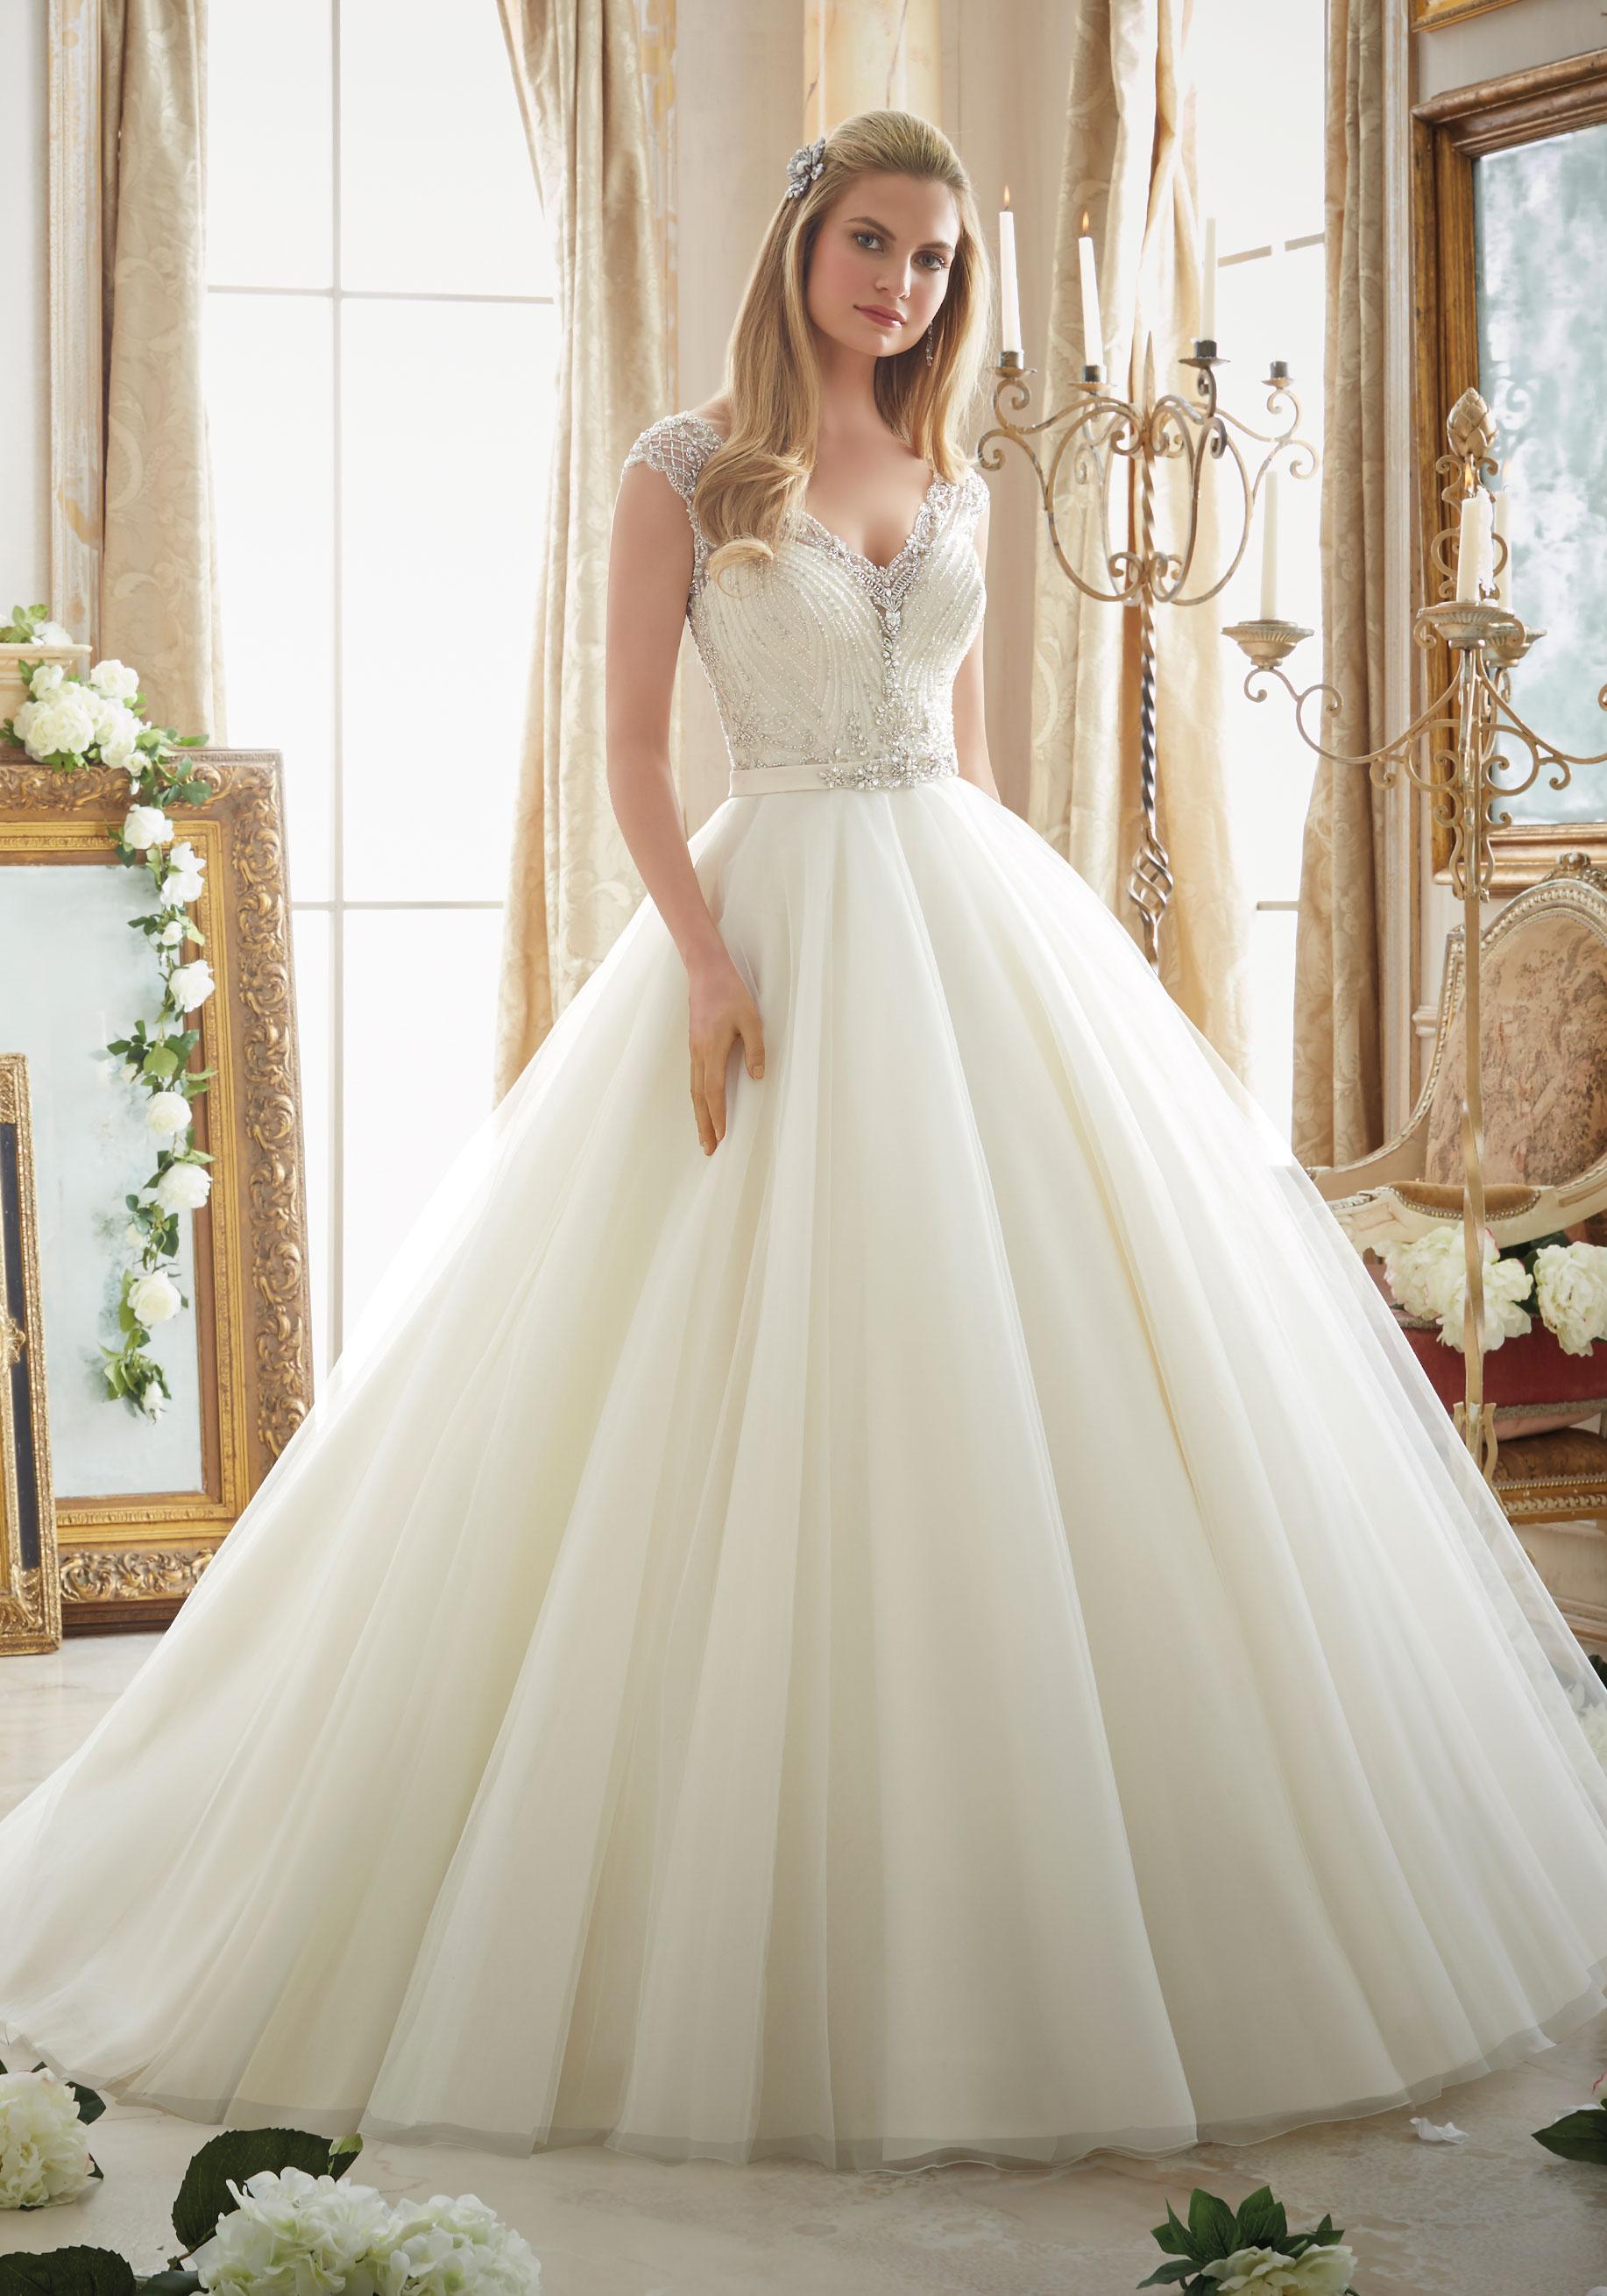 wedding-dress-styles-17 - Top5